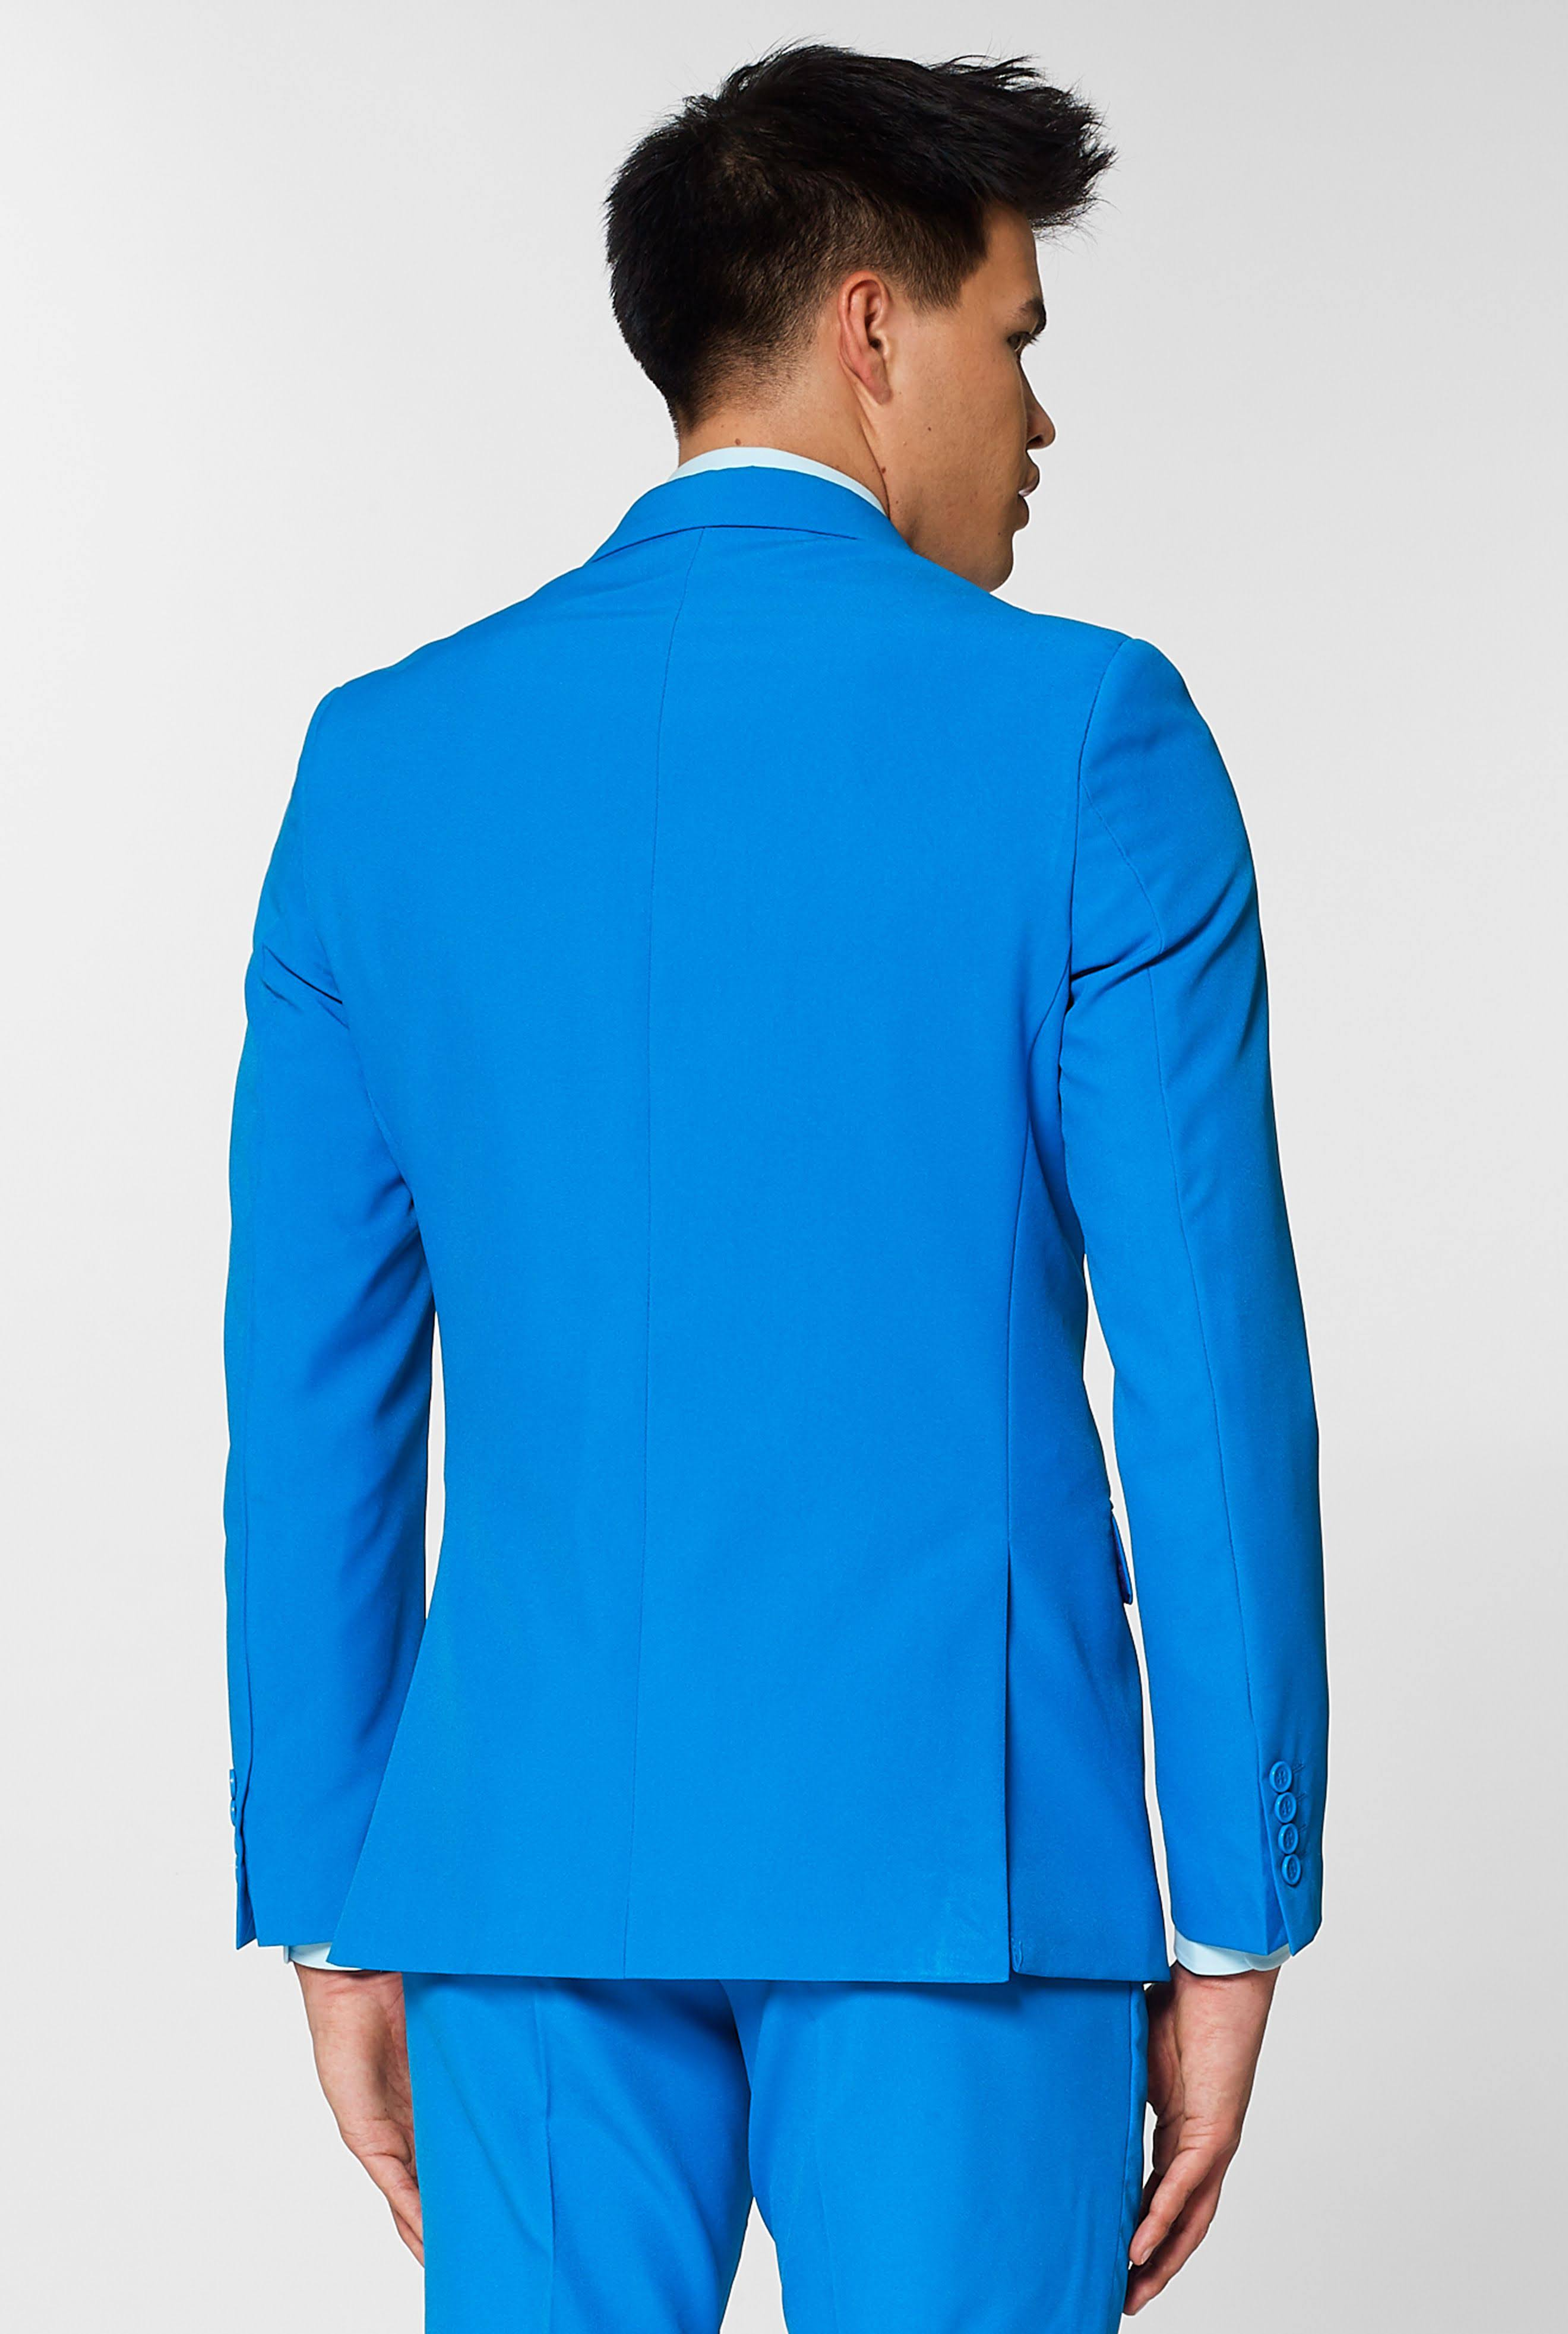 Opposuits Colorful Opposuits Blue Steel Blue Suit 5wavOq